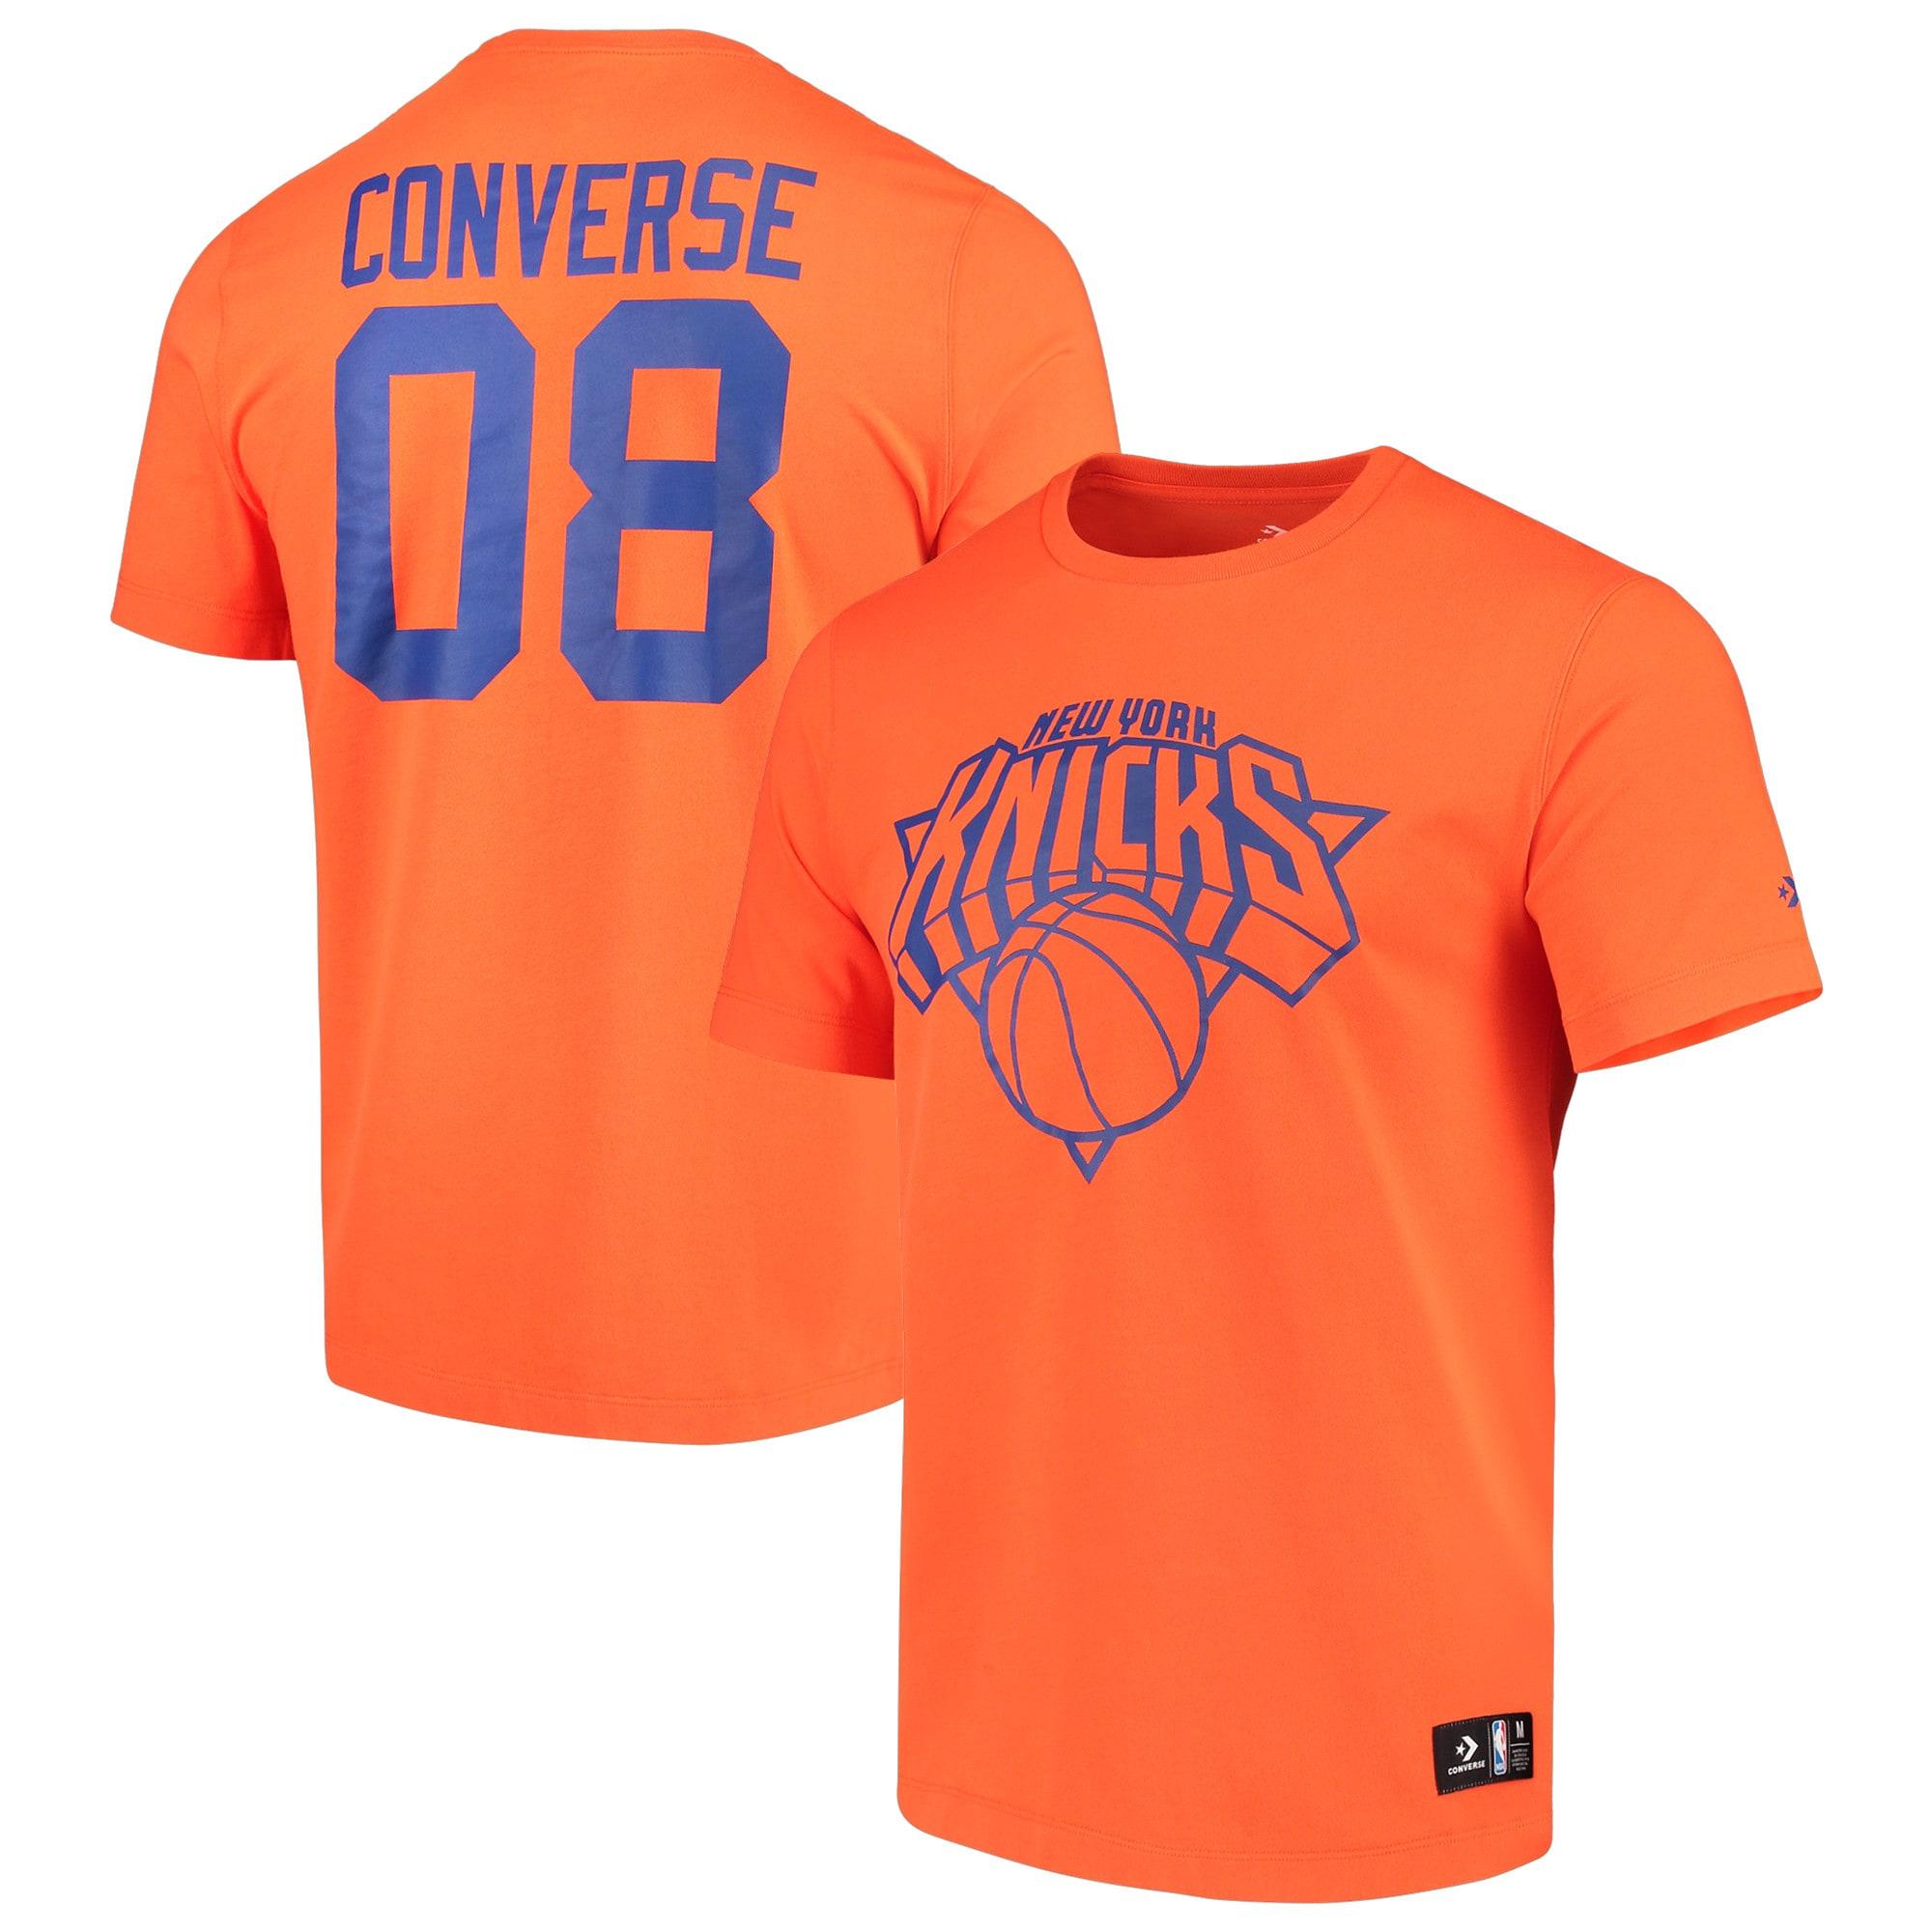 New York Knicks Converse Essentials T-Shirt - Orange